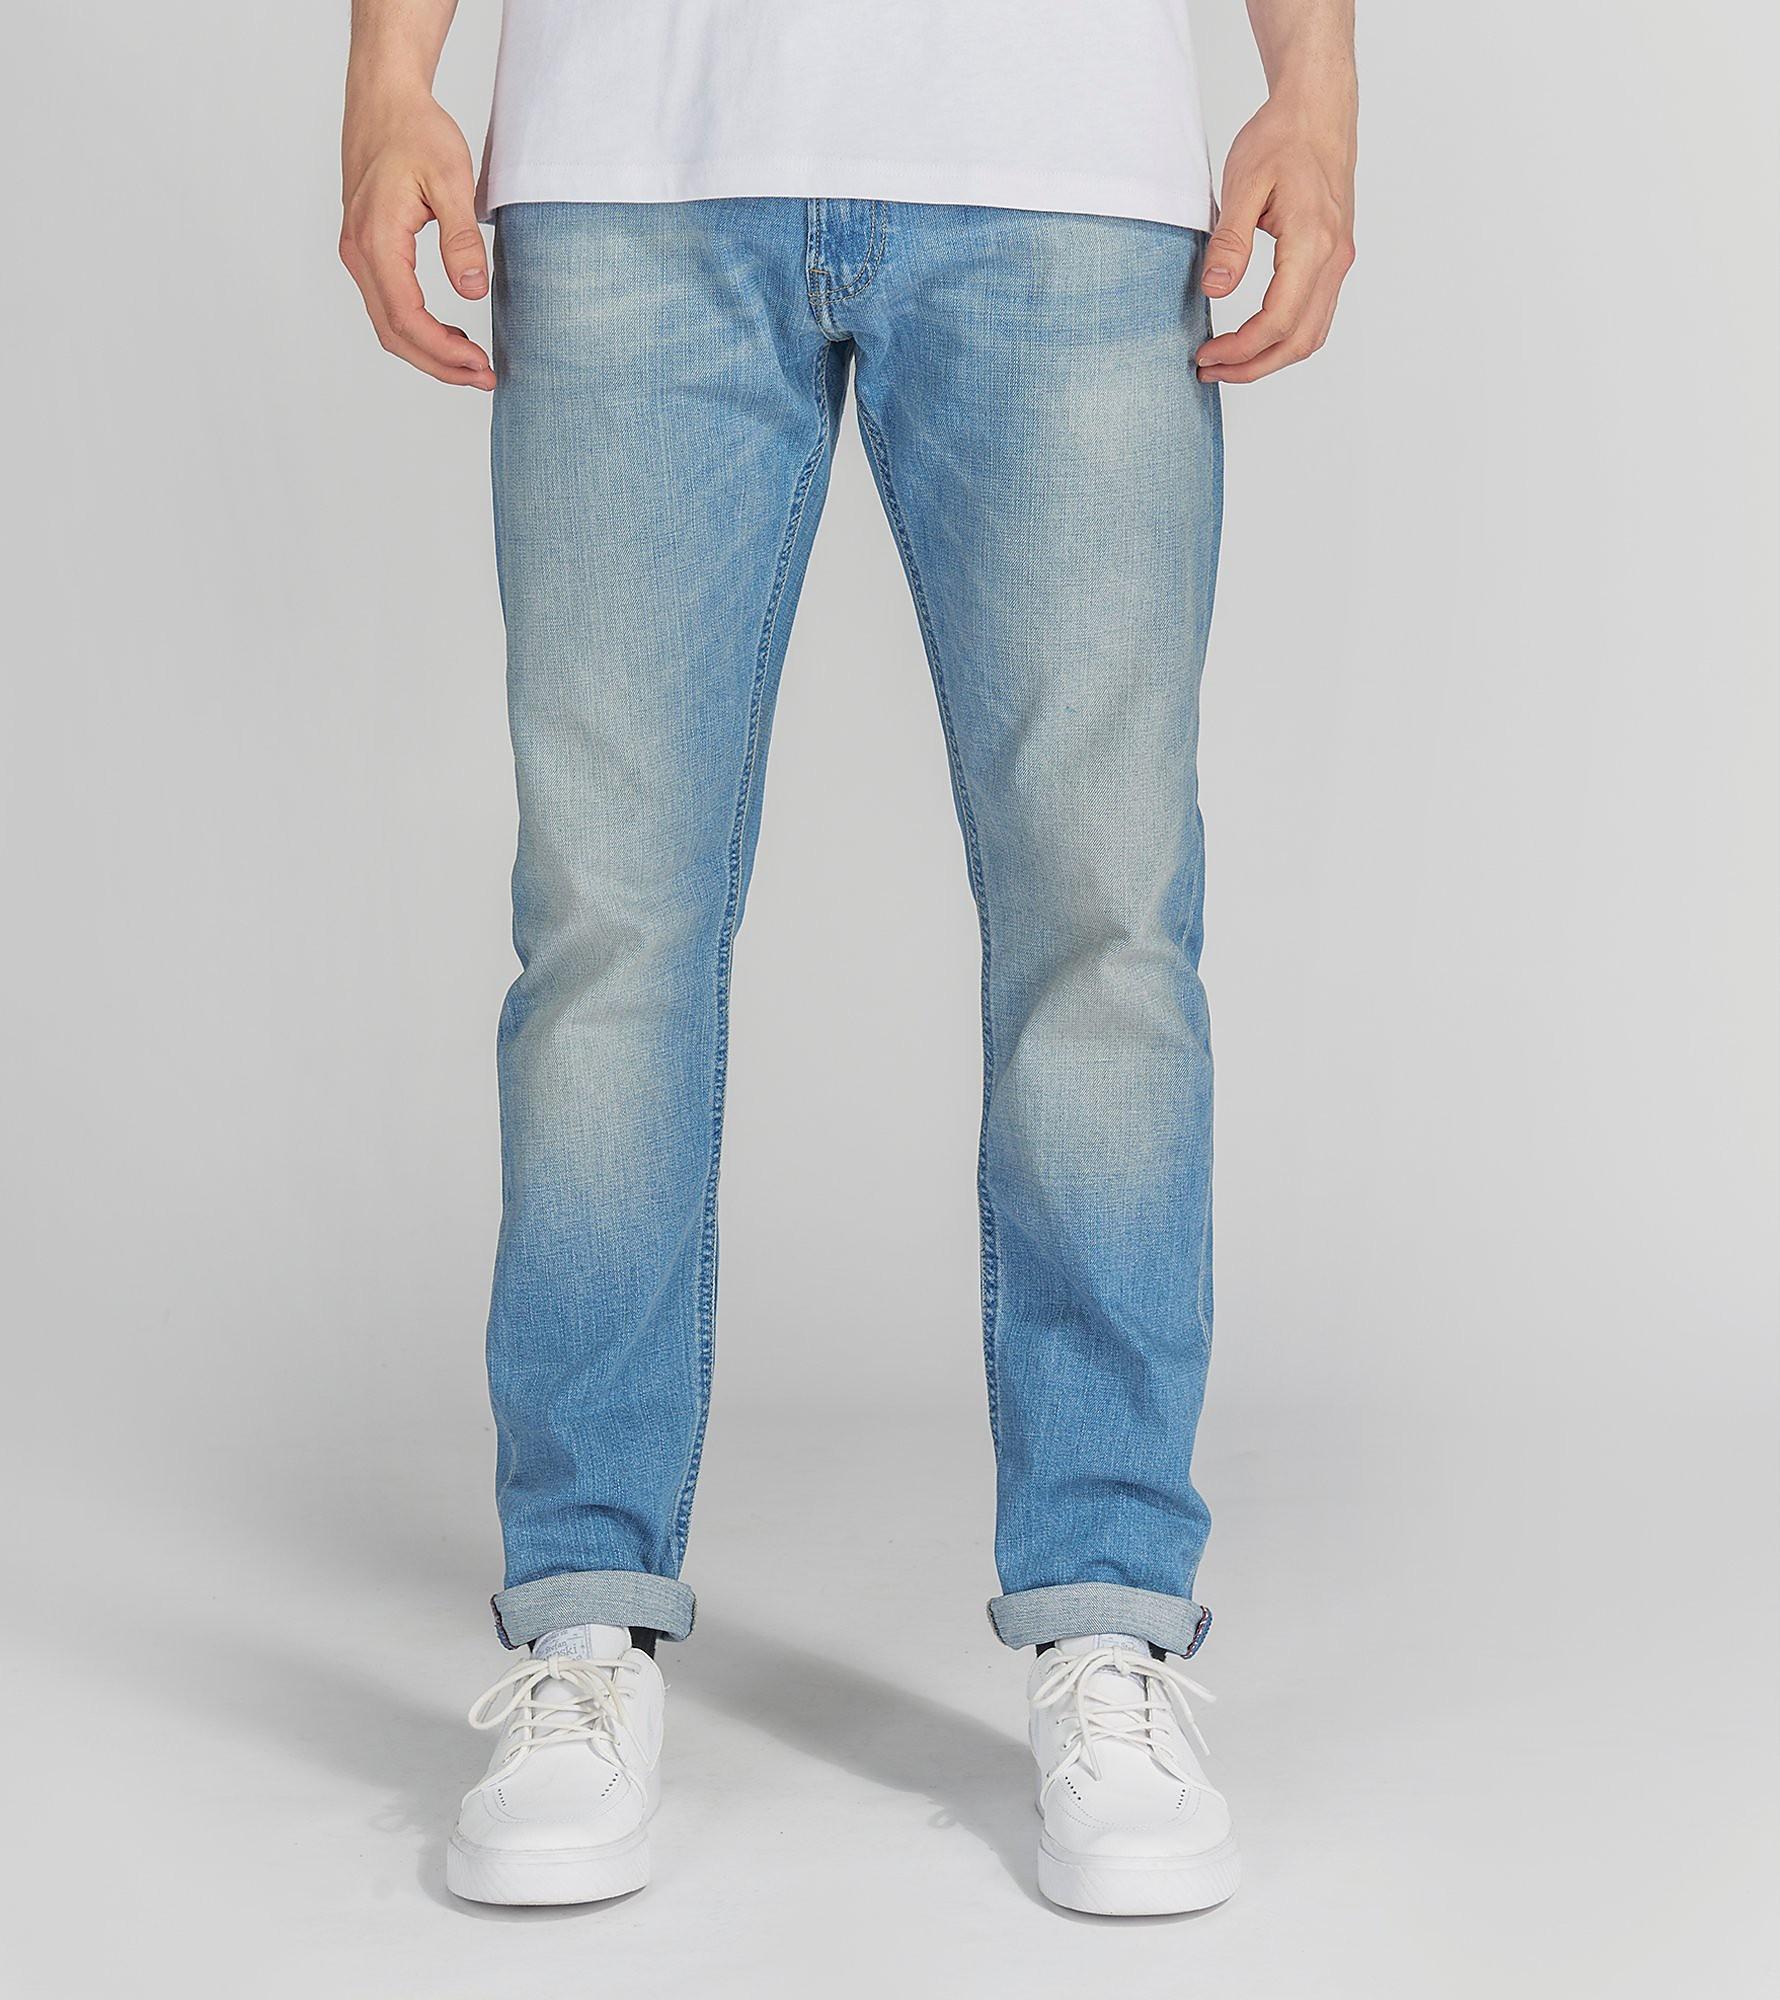 Lee Luke Slim Tapered Jeans 'Beach Blue'